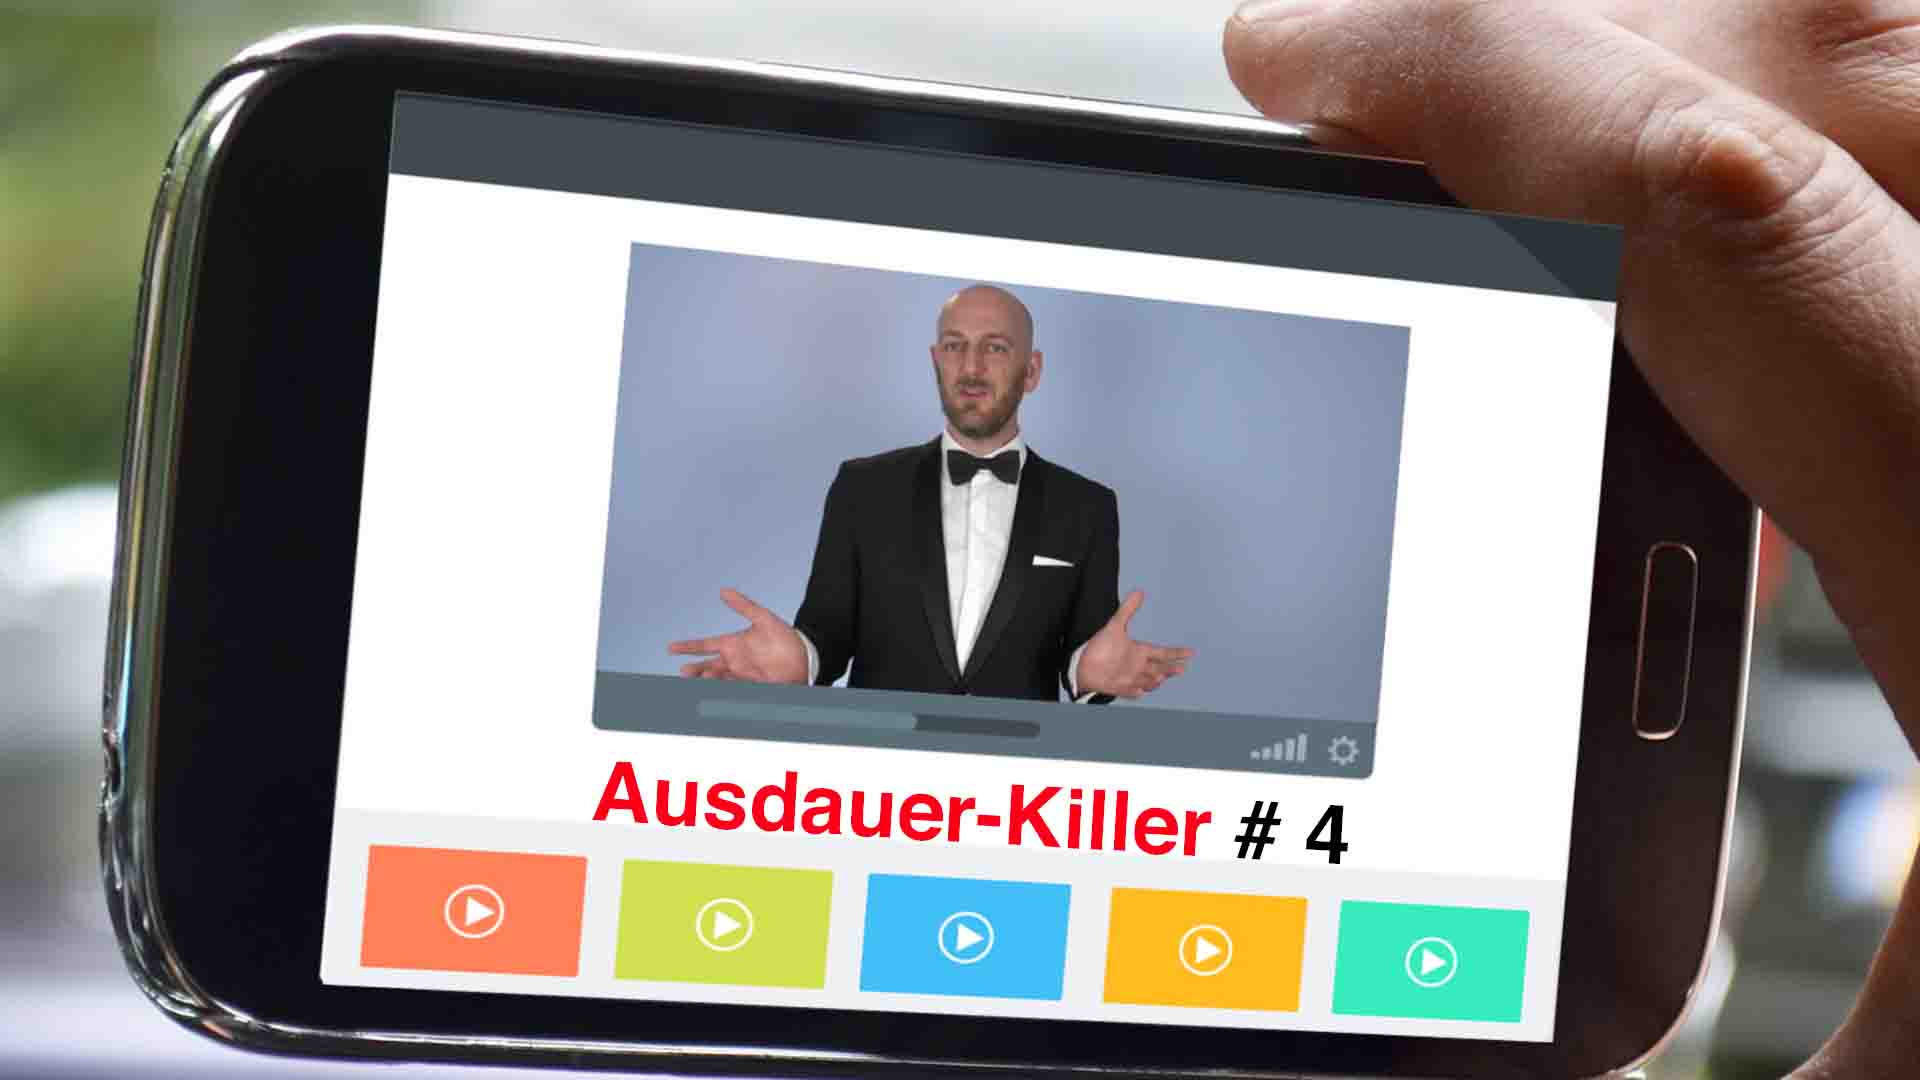 Ausdauer Killer #4